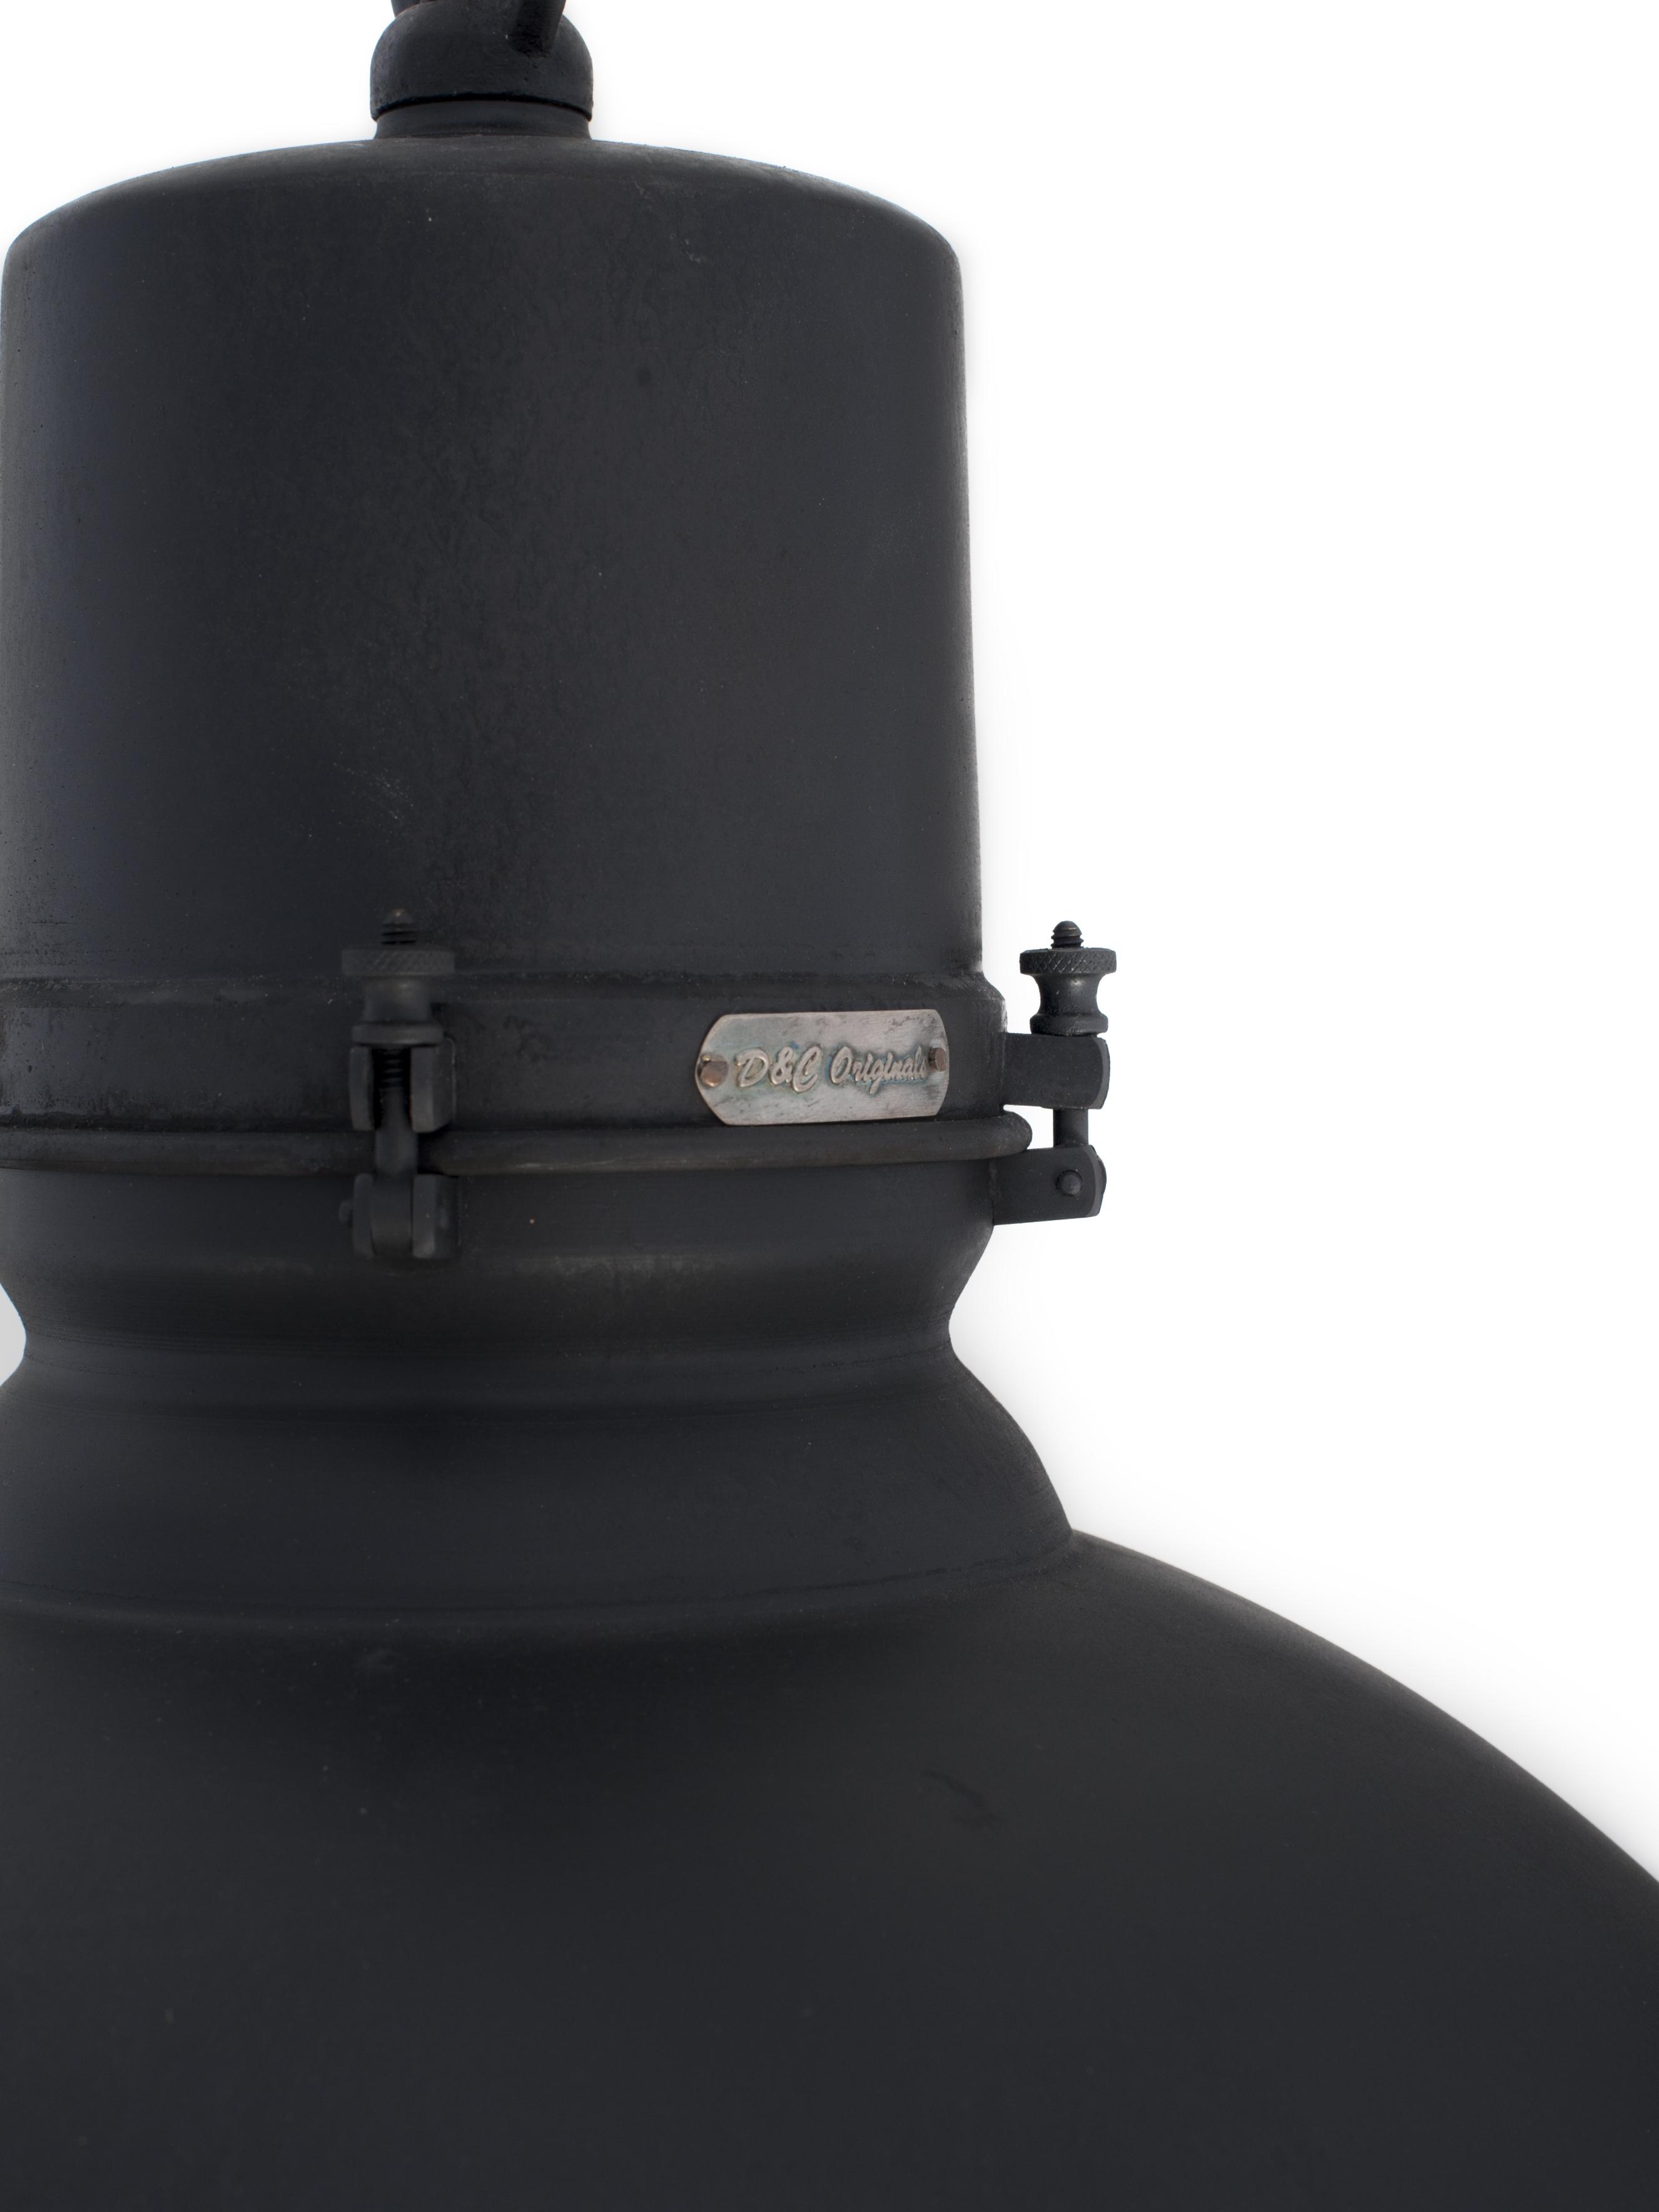 Industriele Keuken Particulier : Home > Producten > Grote lampen > Grote Fabriekslamp Zwart DU-1003